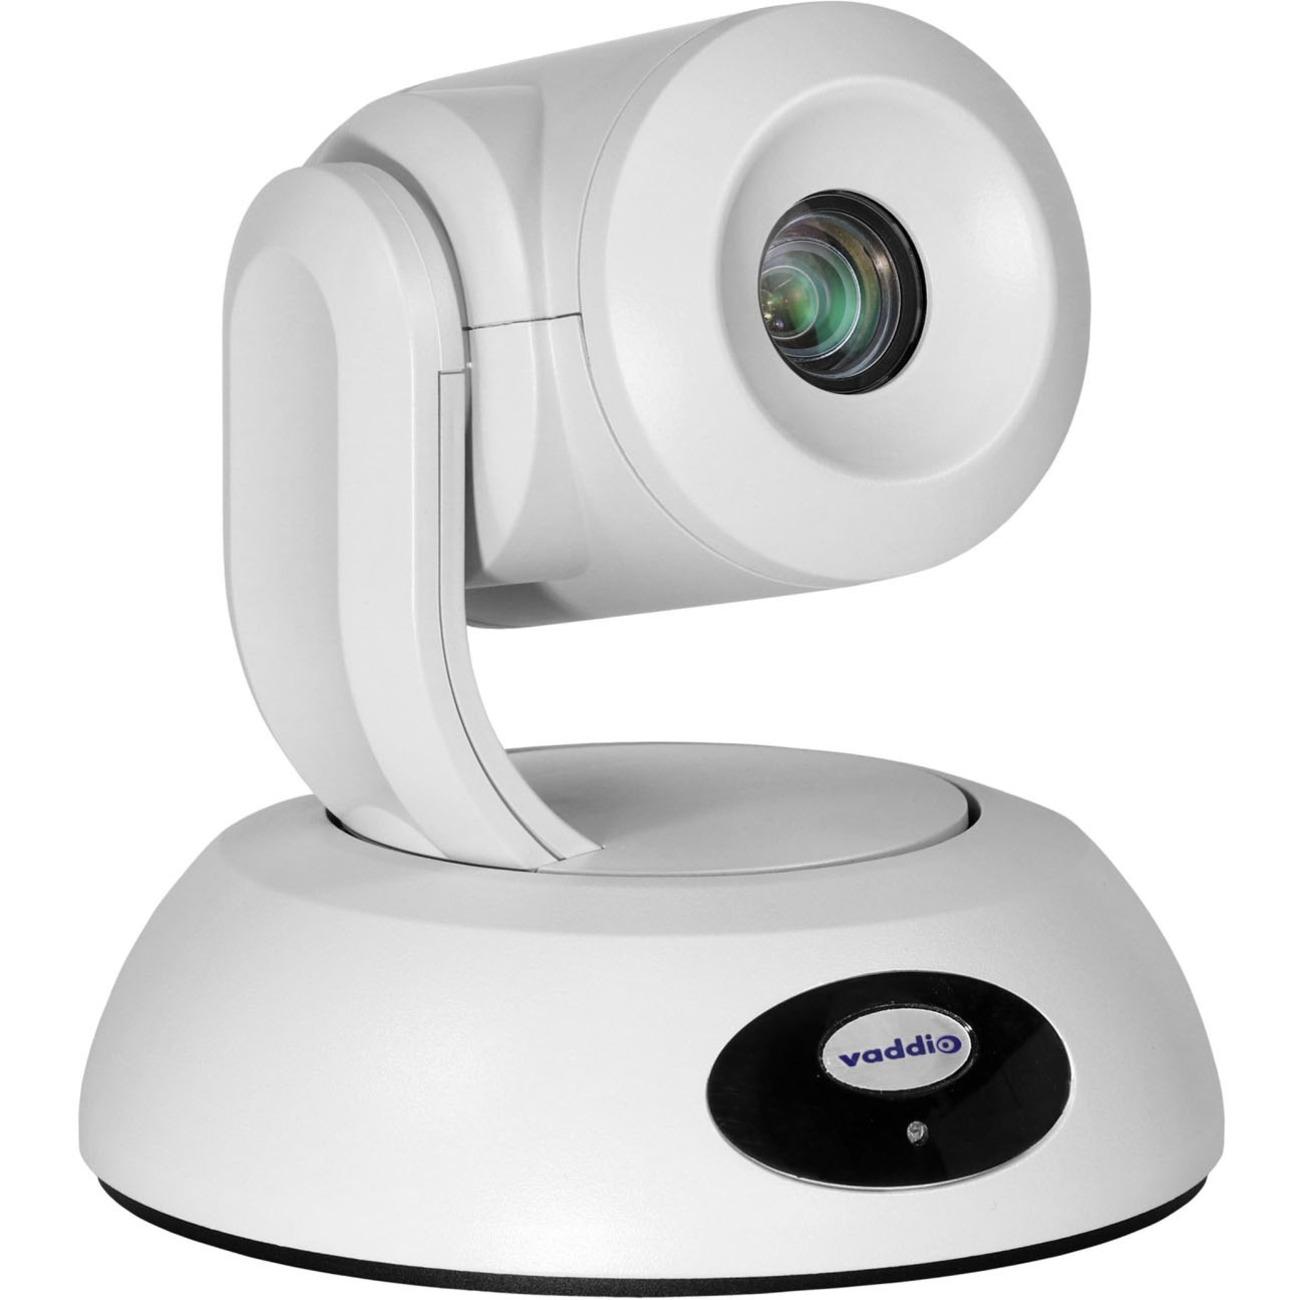 Vaddio RoboSHOT Elite Video Conferencing Camera - 8.5 Megapixel - 60 fps - White - USB 3.0 - 1 Pack(s)_subImage_1